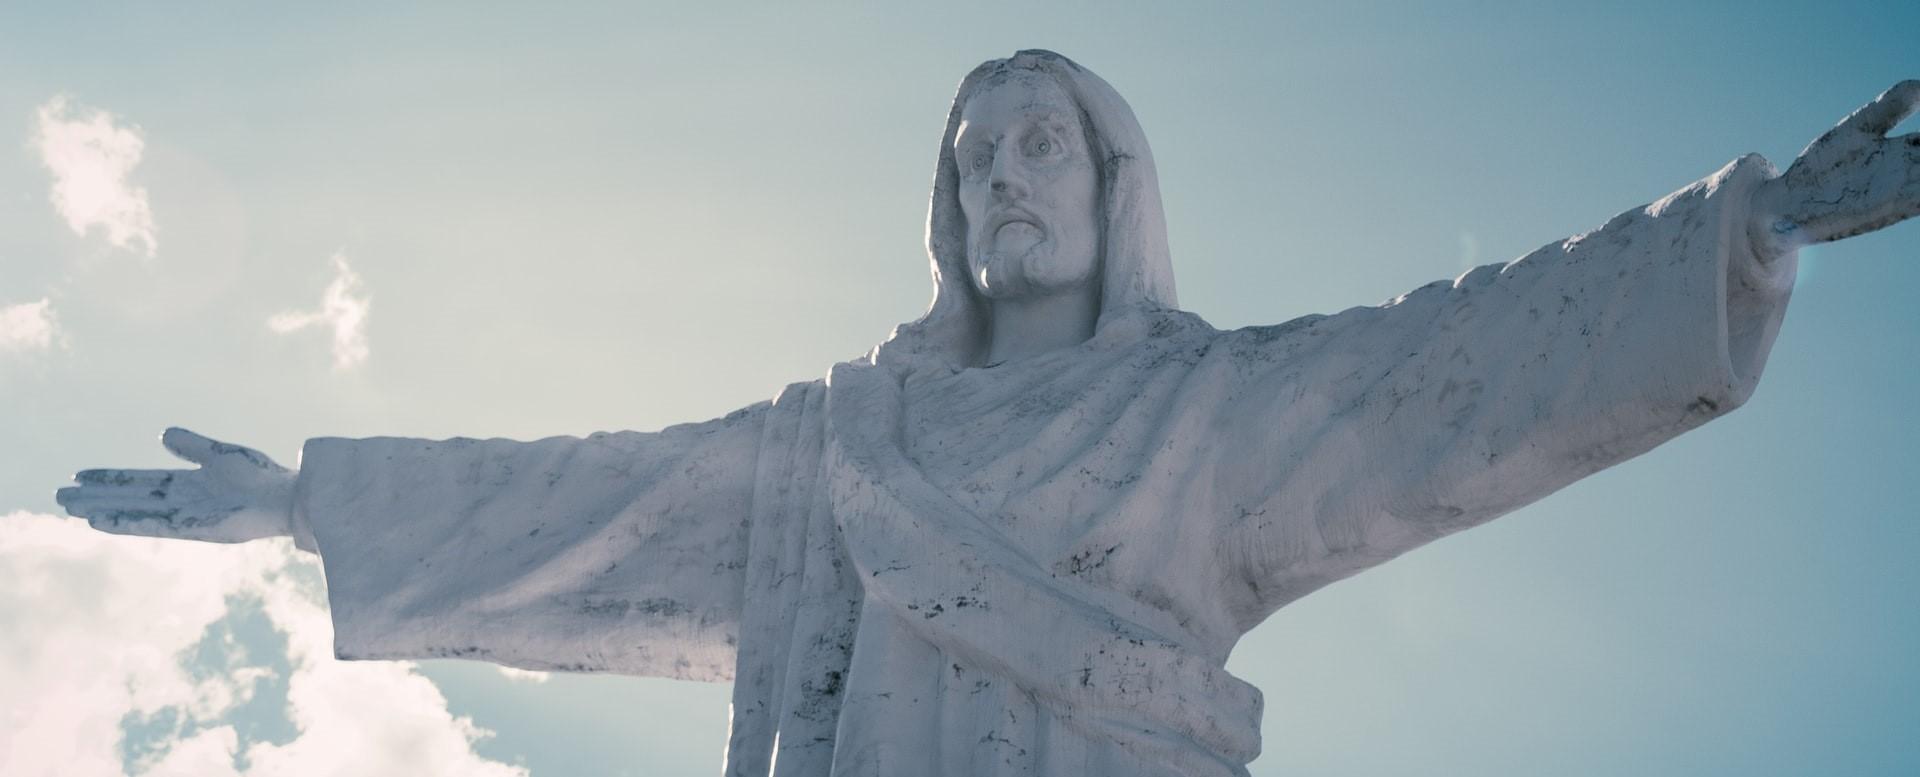 zachary-olson-jesus